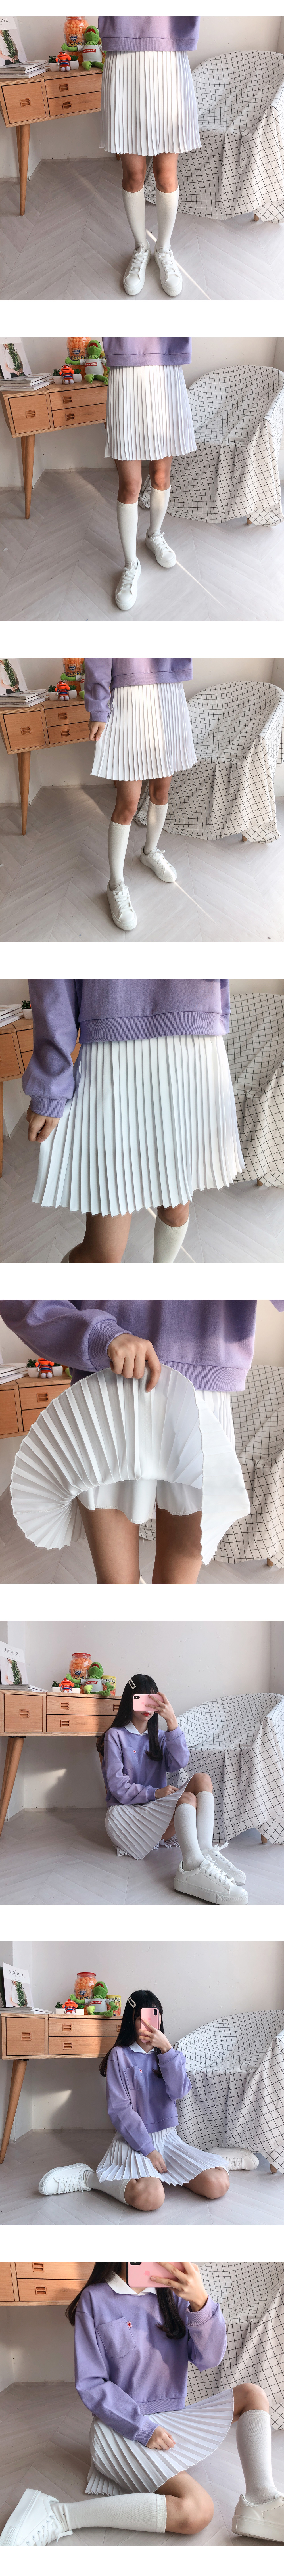 Sun miniplex skirt